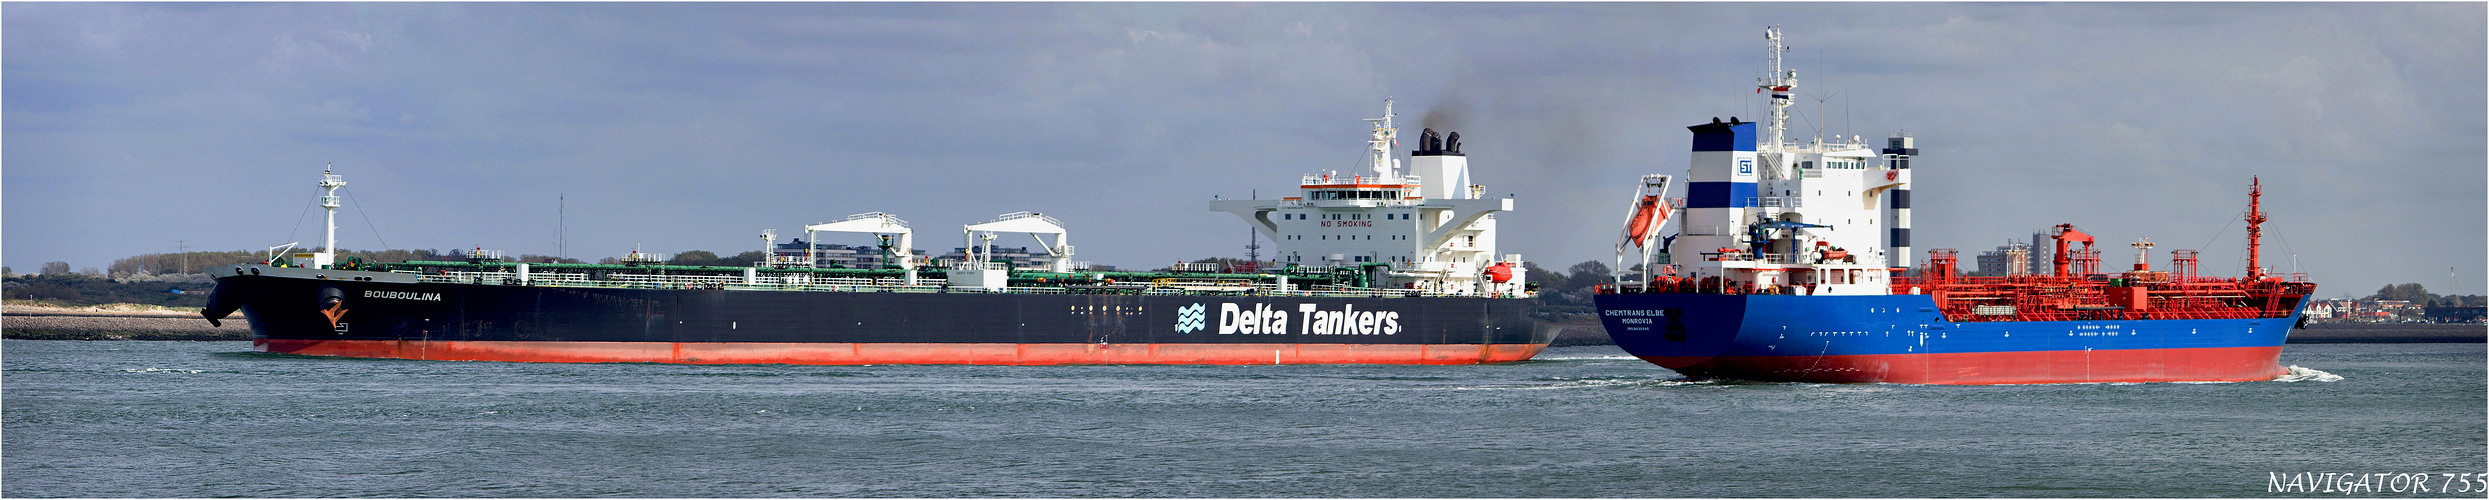 BOUBOULINA / Crude Oil Tanker / CHEMTRANS ELBE / Tanker / Rotterdam / Bitte scrollen!